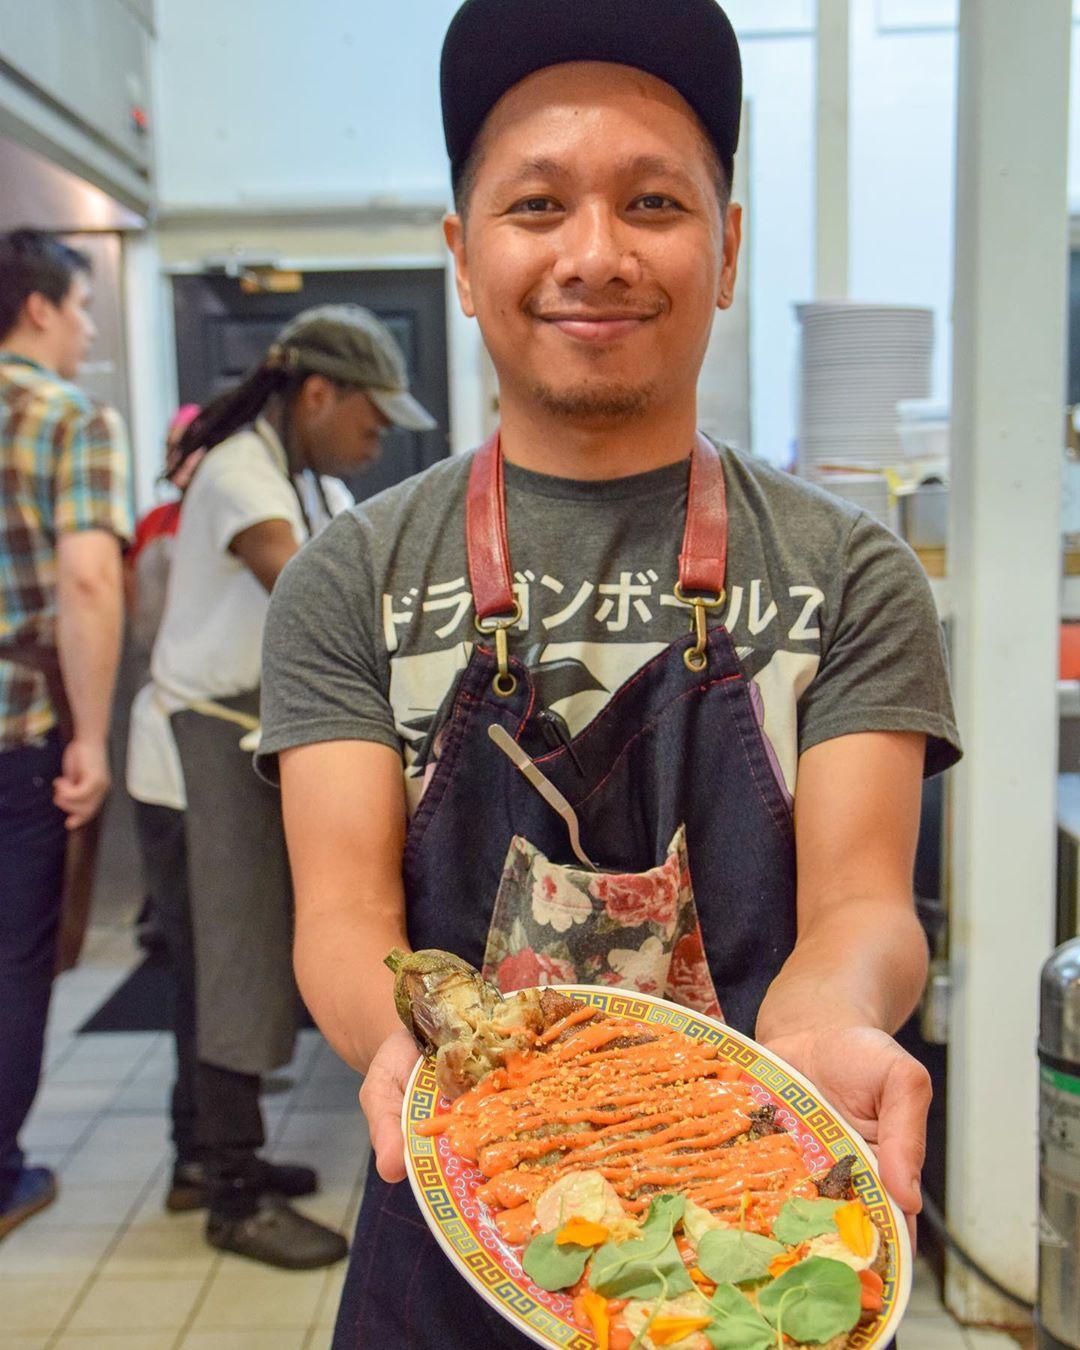 No Forks Needed at Mansueta's Filipino Feast